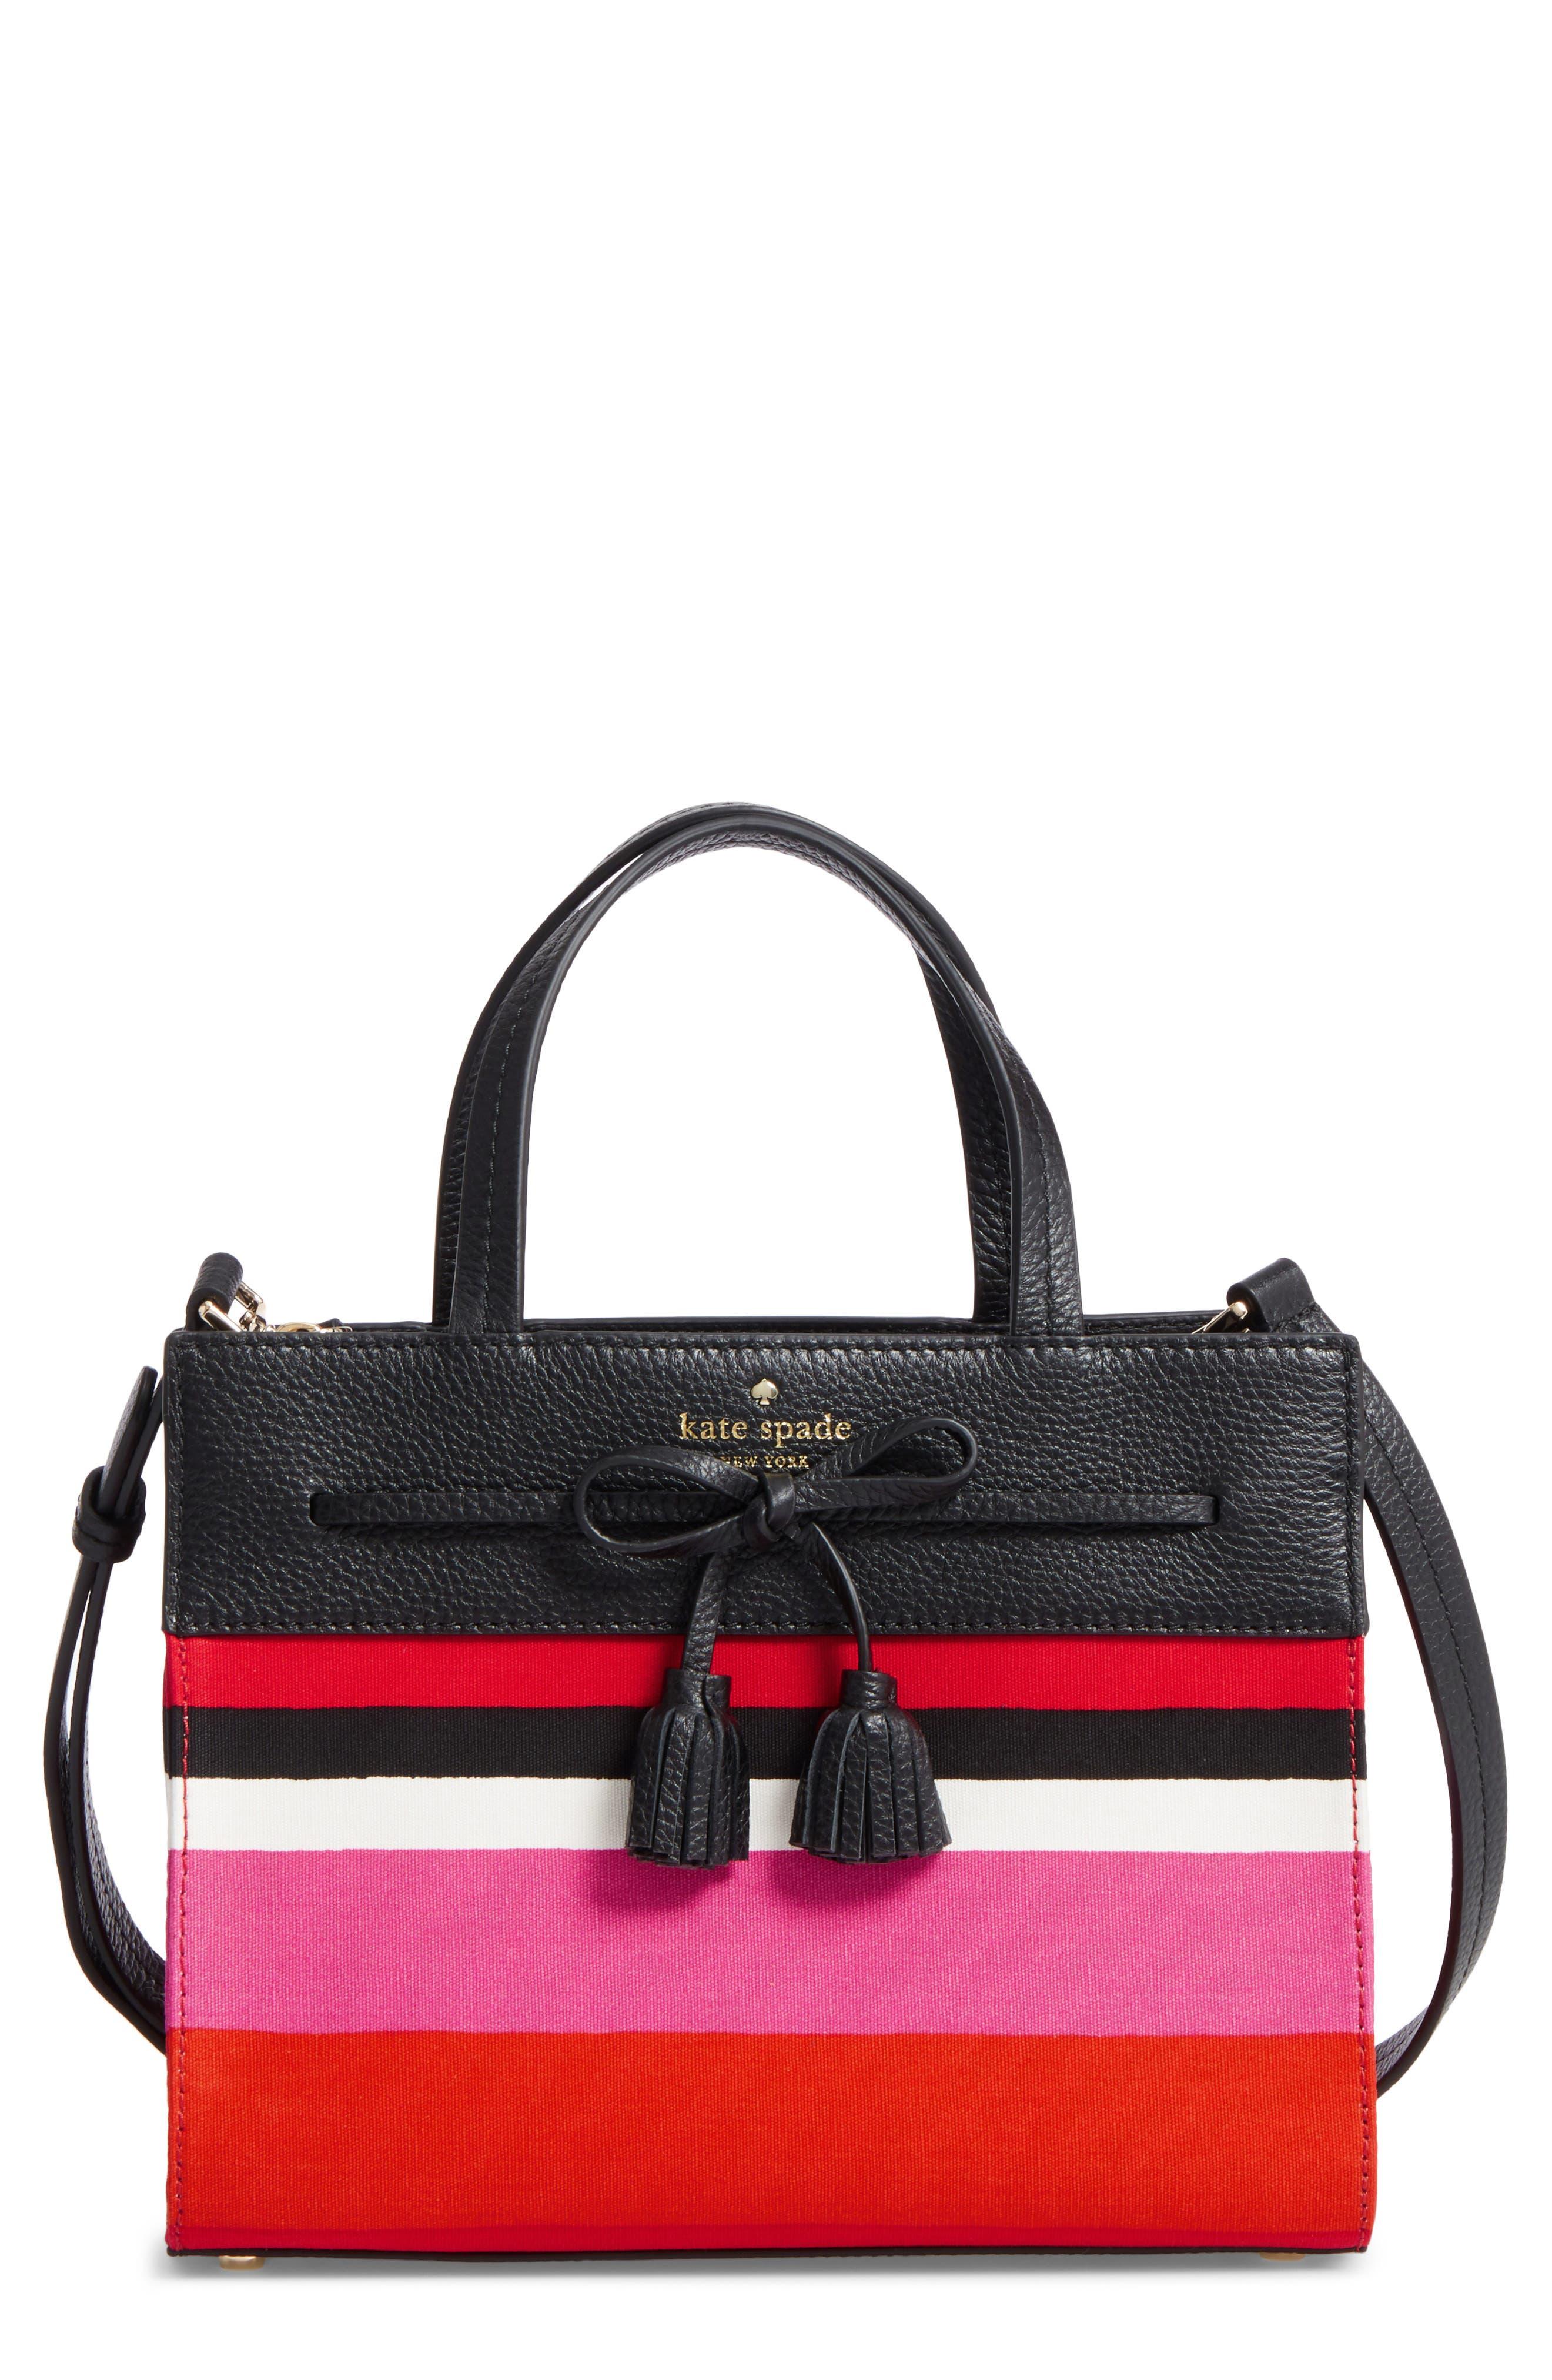 KATE SPADE NEW YORK hayes street stripe isobel satchel